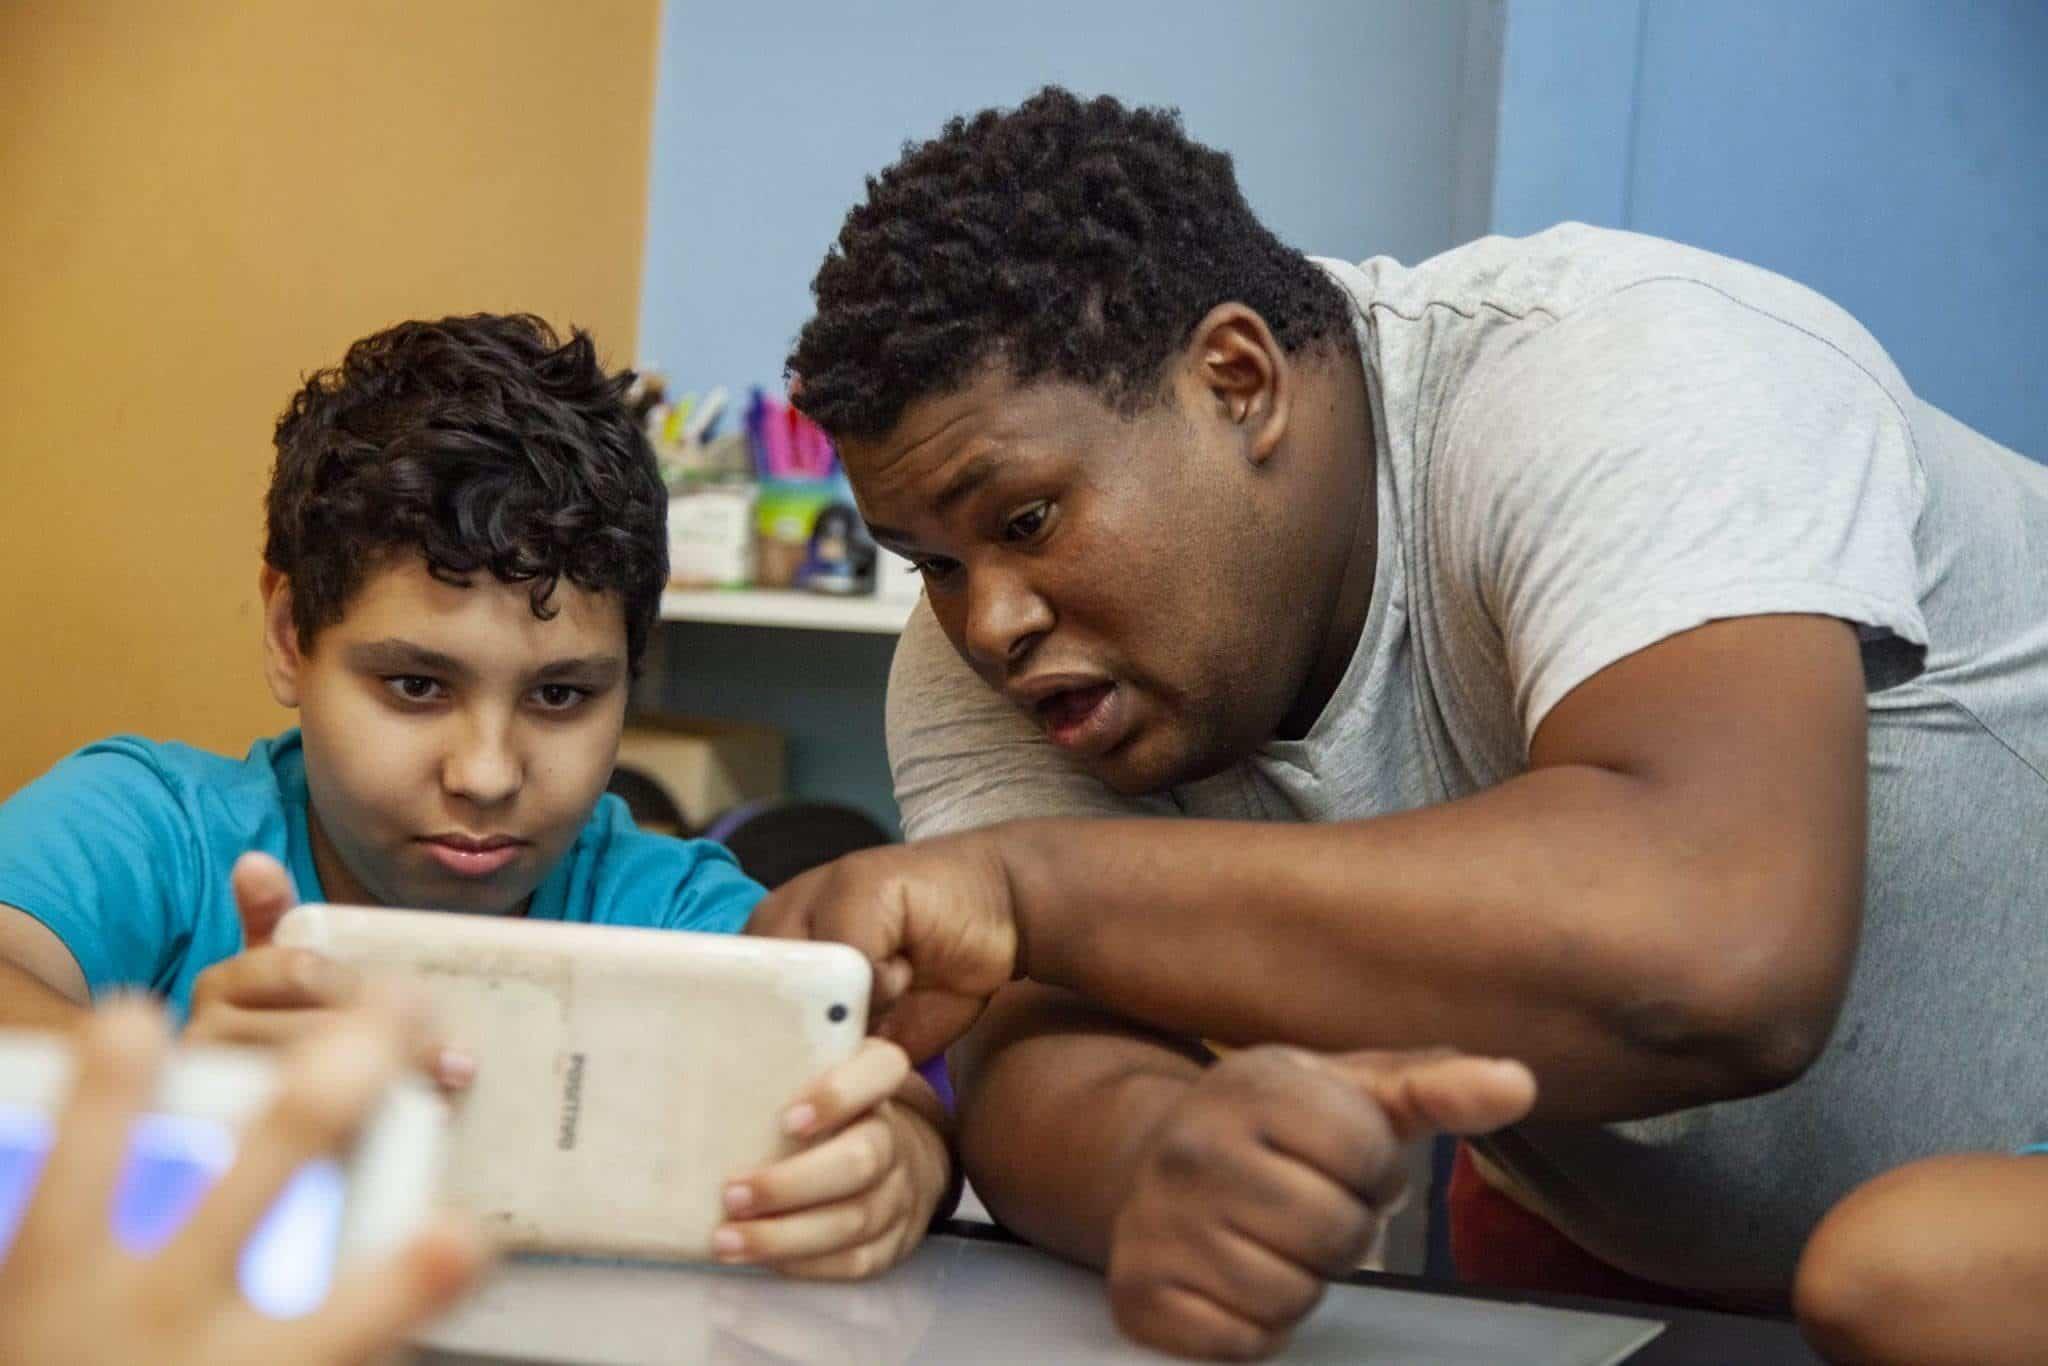 Educador Diego da Mata ensinando jovem no tablet